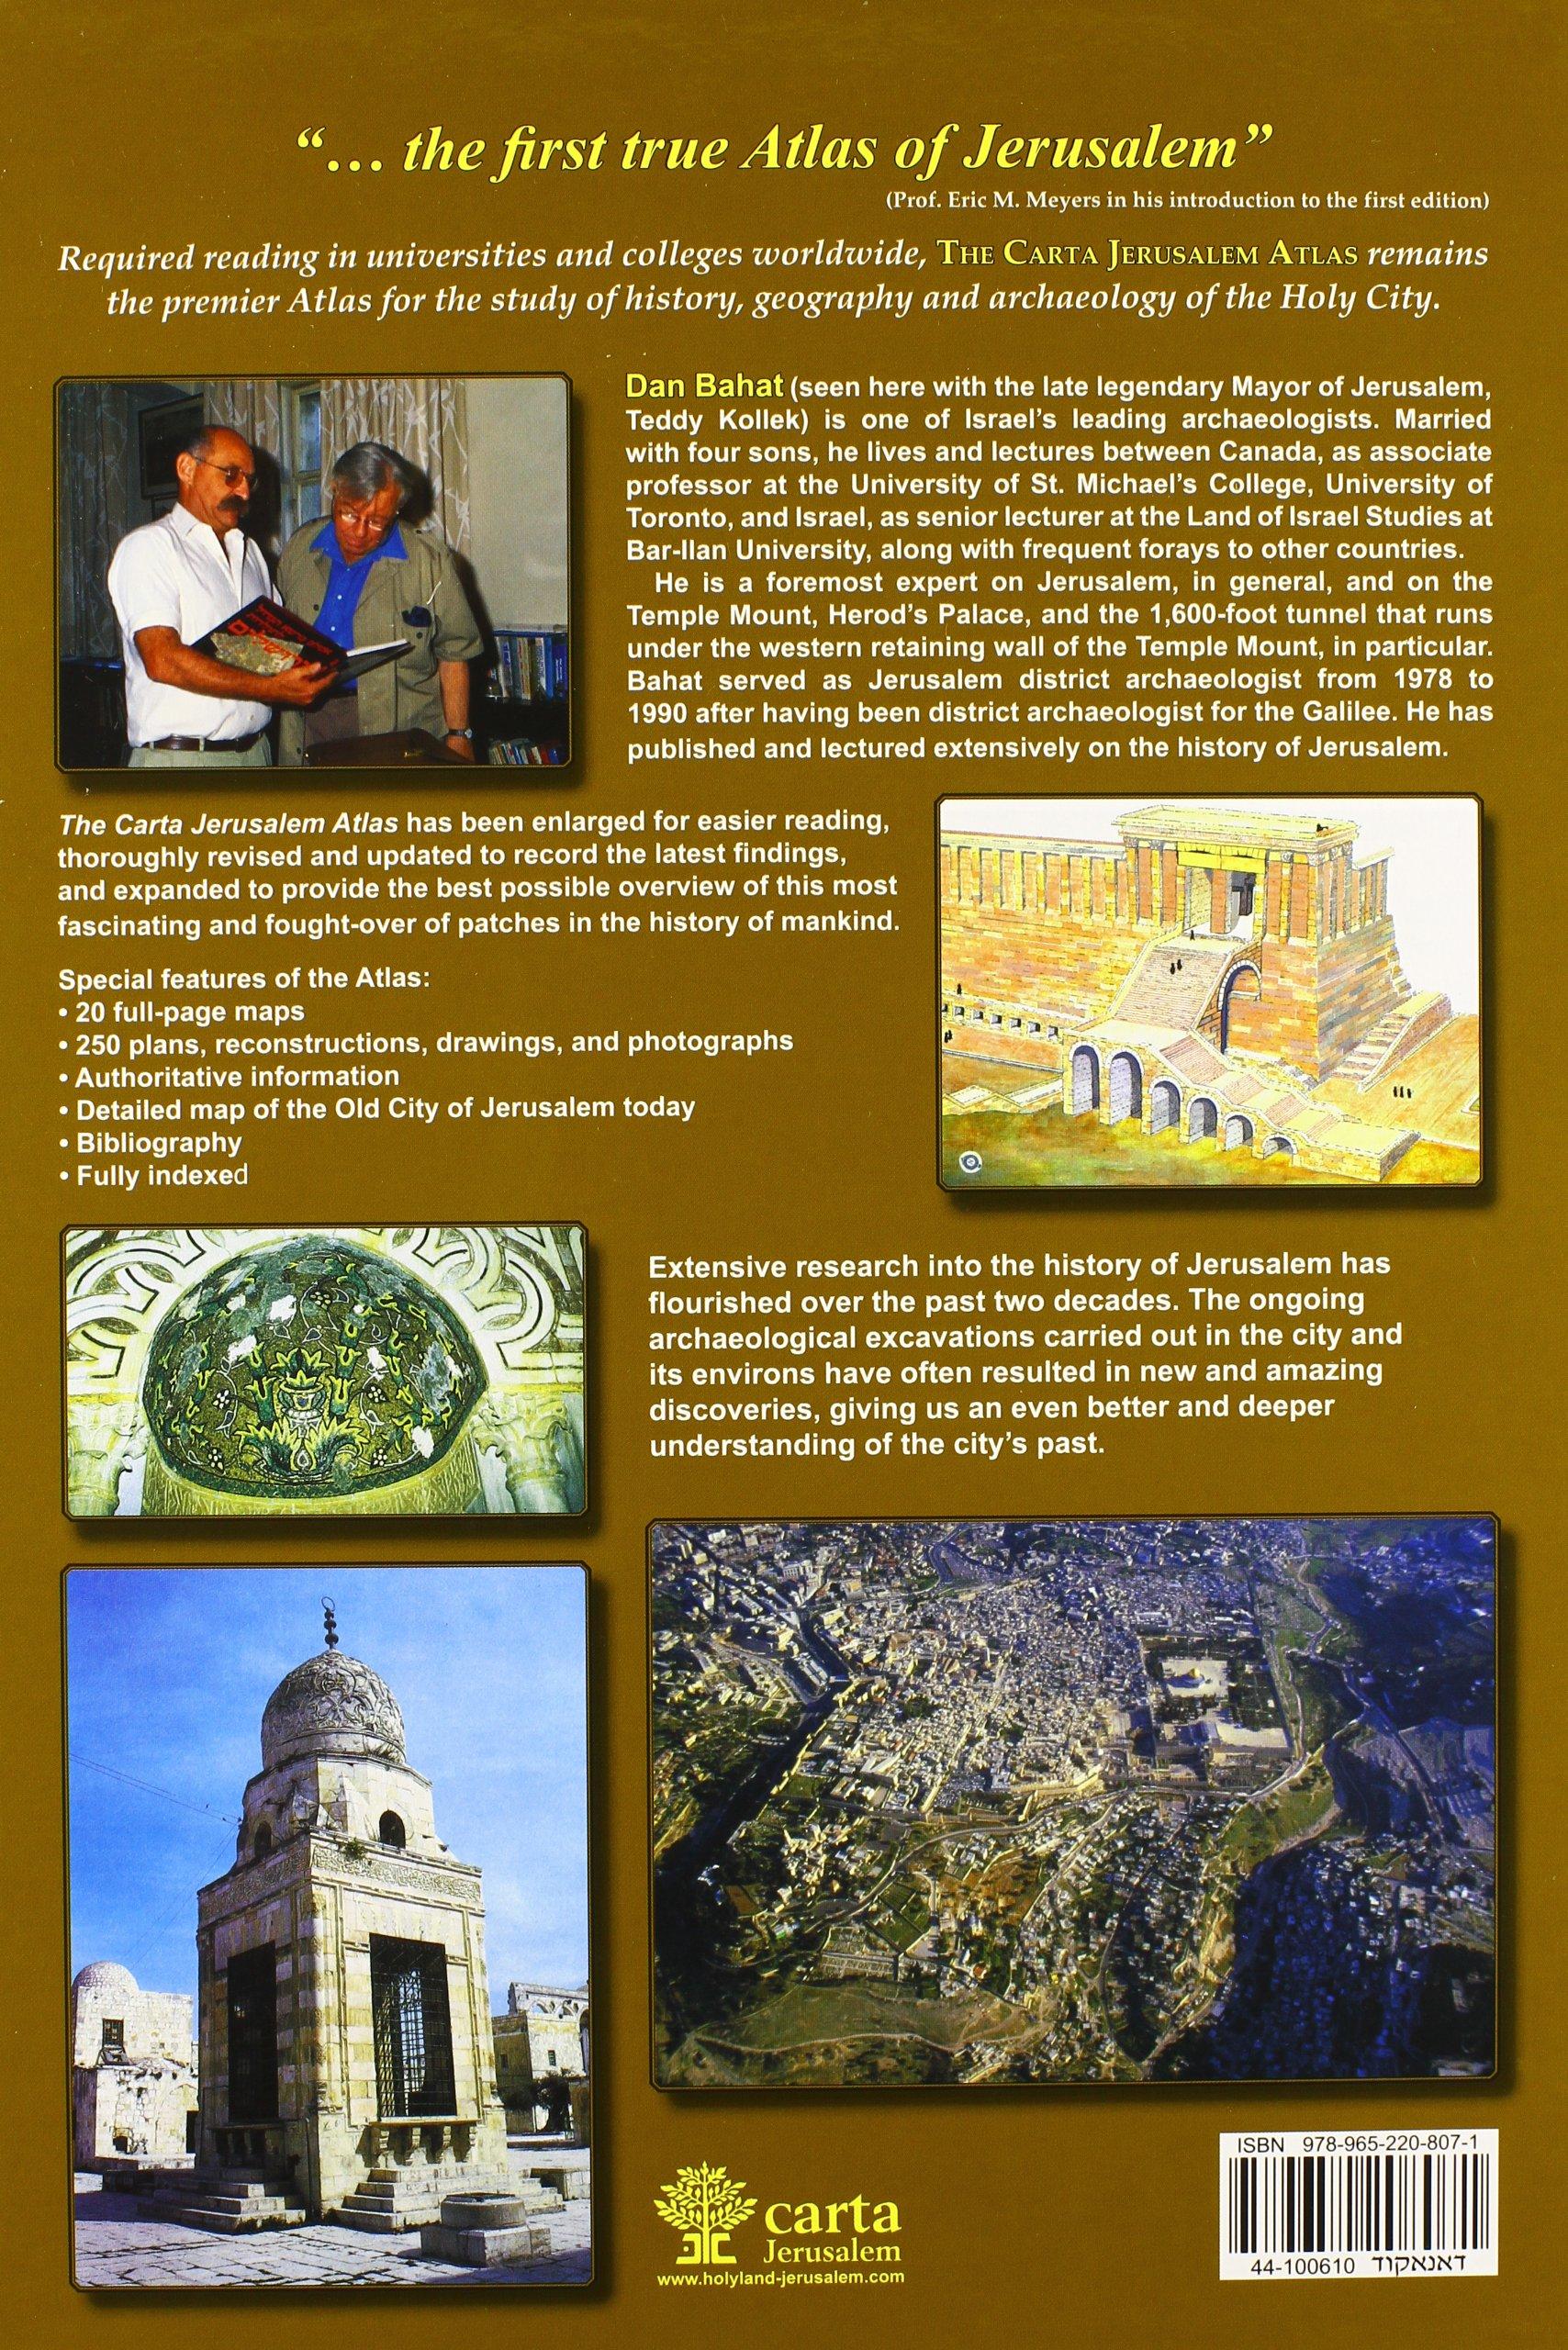 The Carta Jerusalem Atlas (Formerly Illustrated Atlas of Jerusalem)